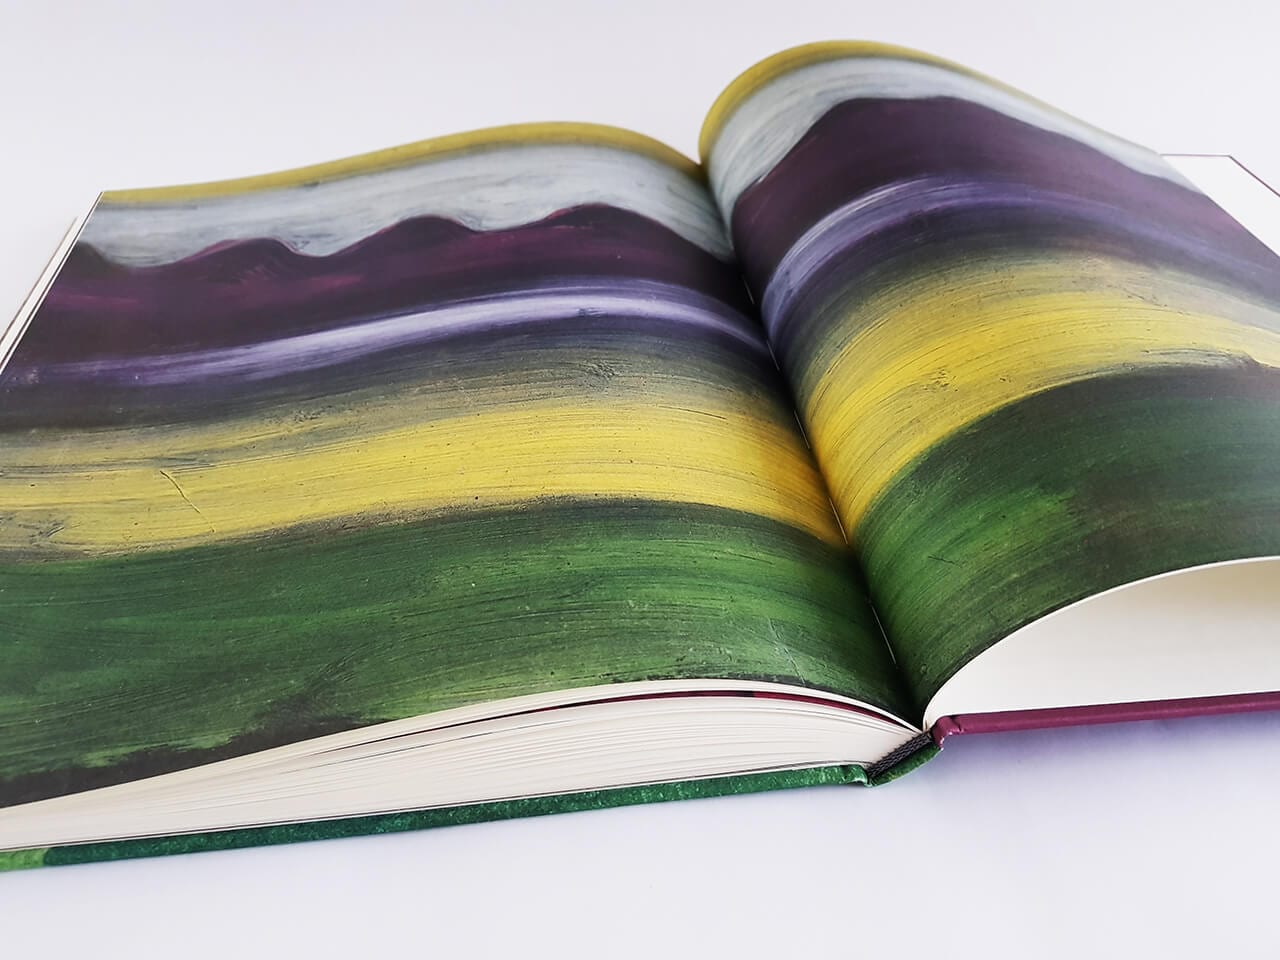 augeschlagenes Buch namens Paul Klee Landschaften Hirmer Verlag